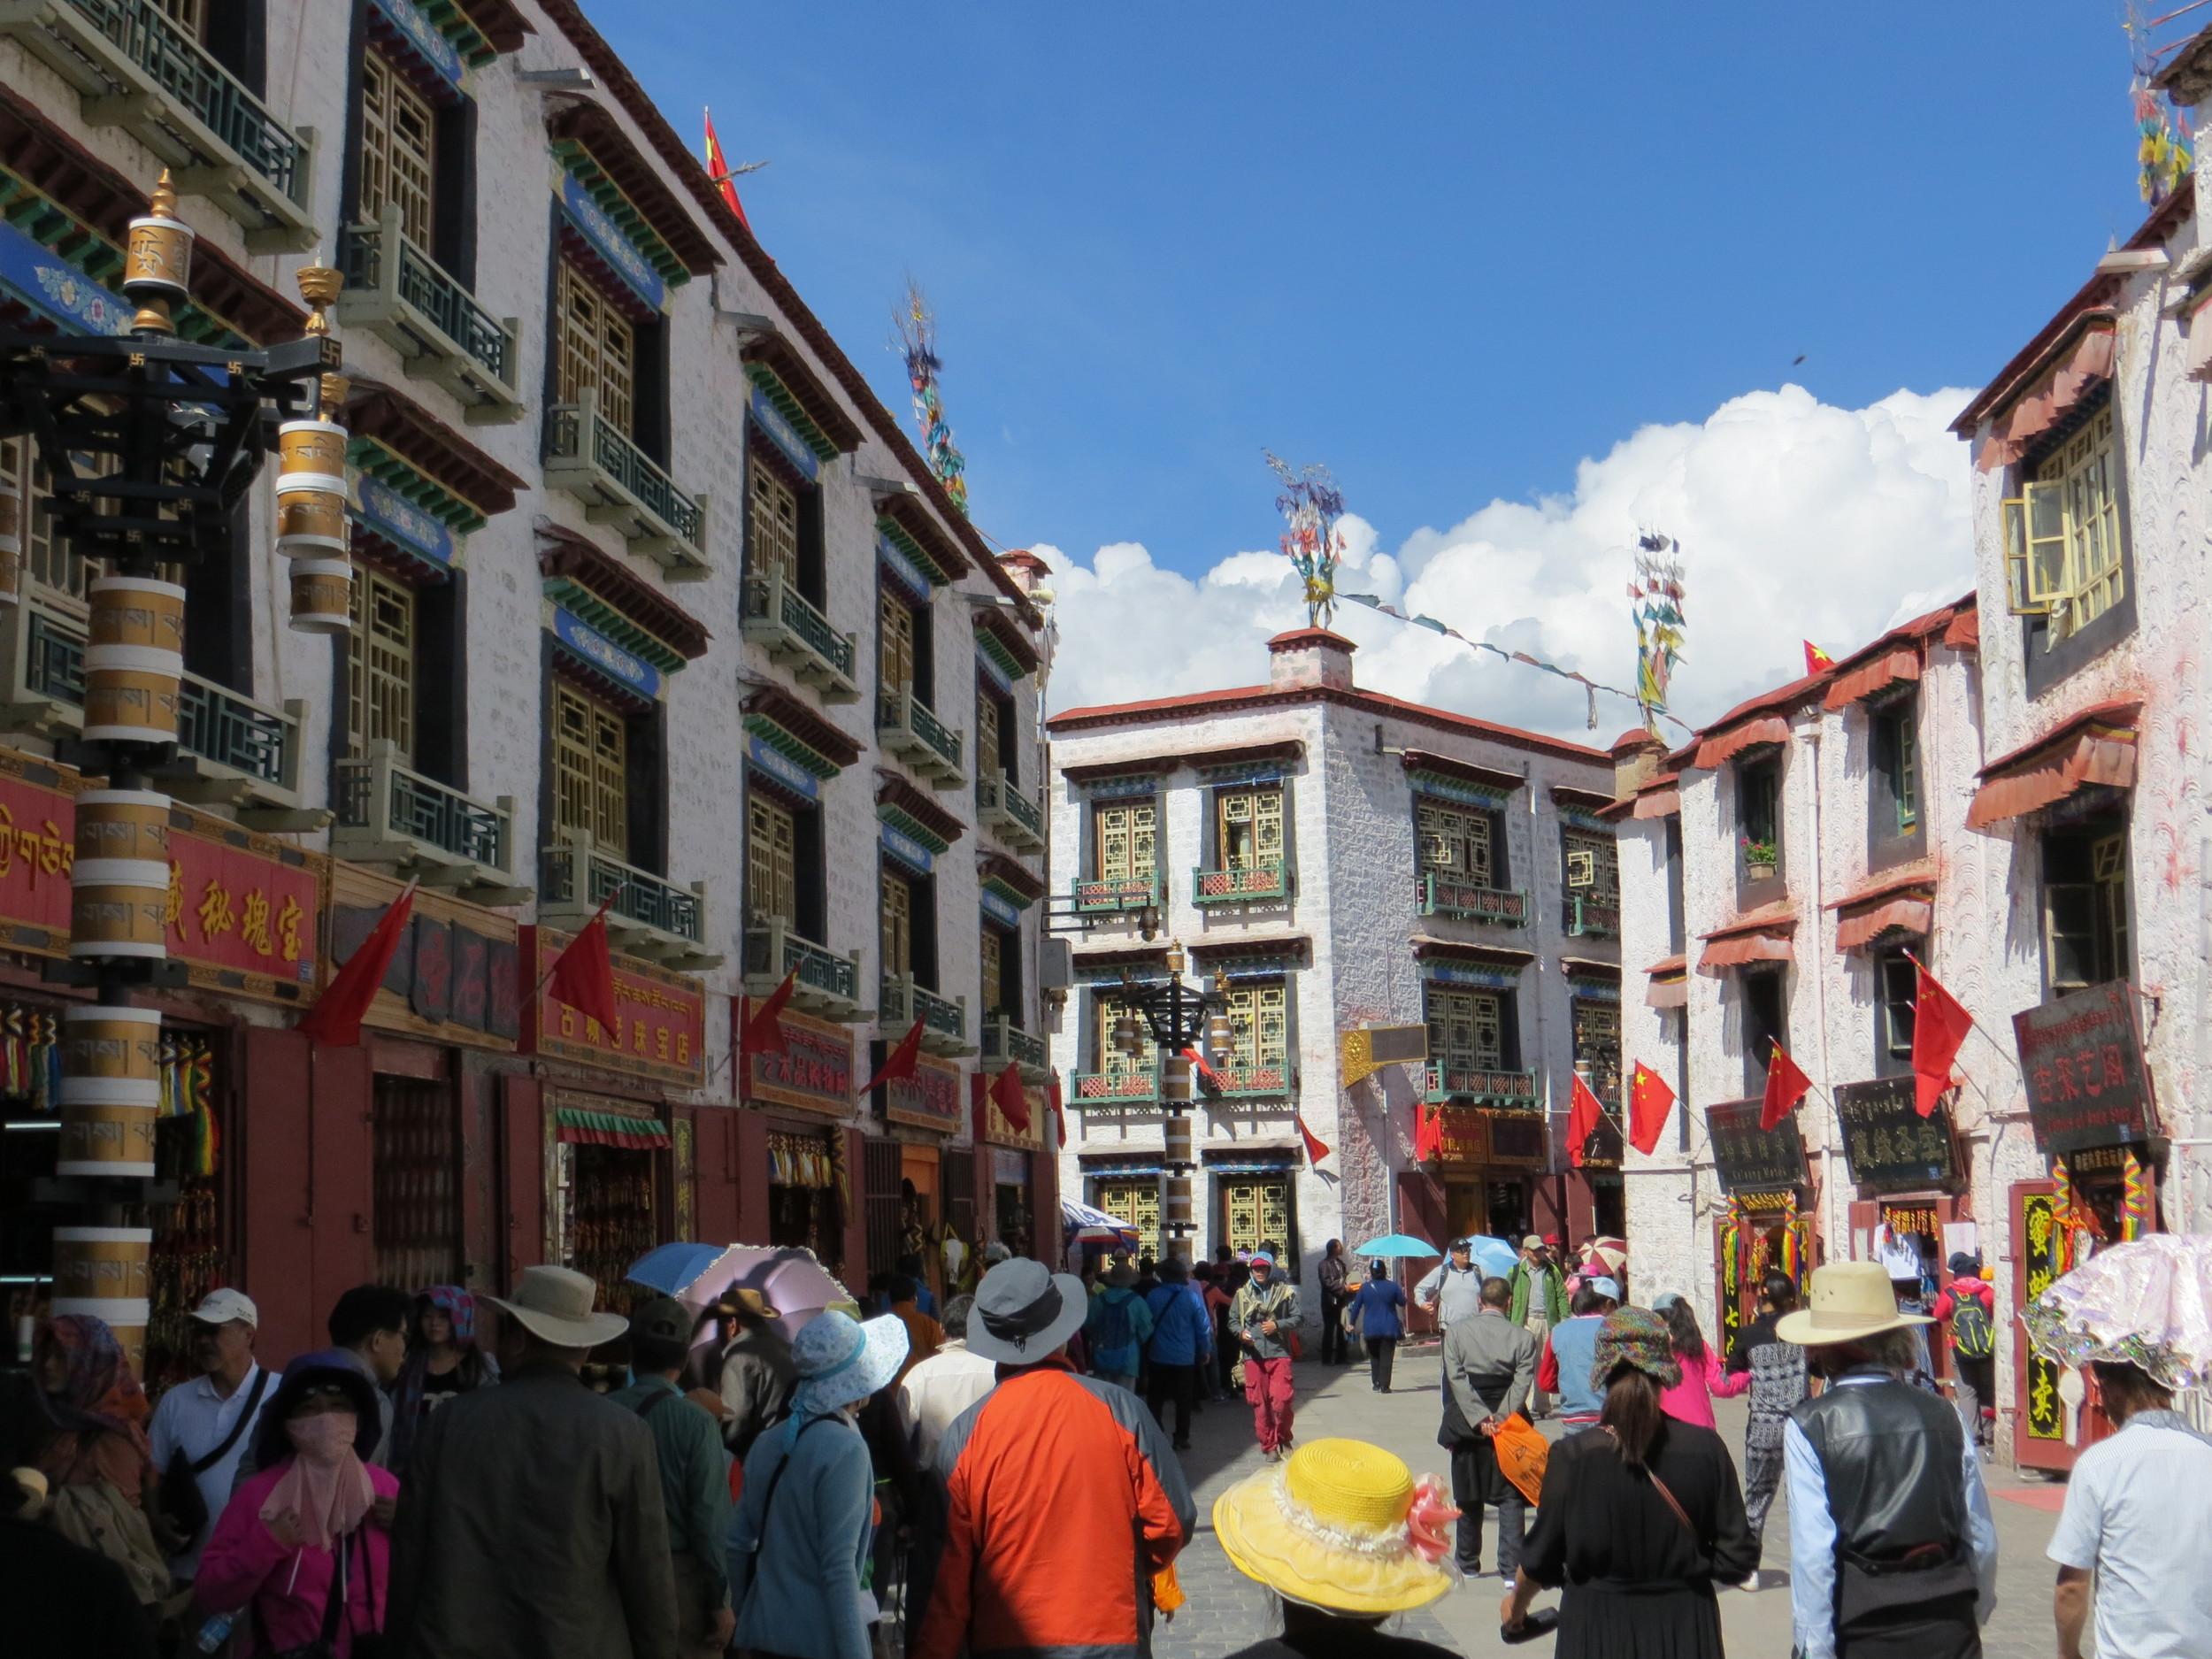 Barker street- The Mecca of Tibet